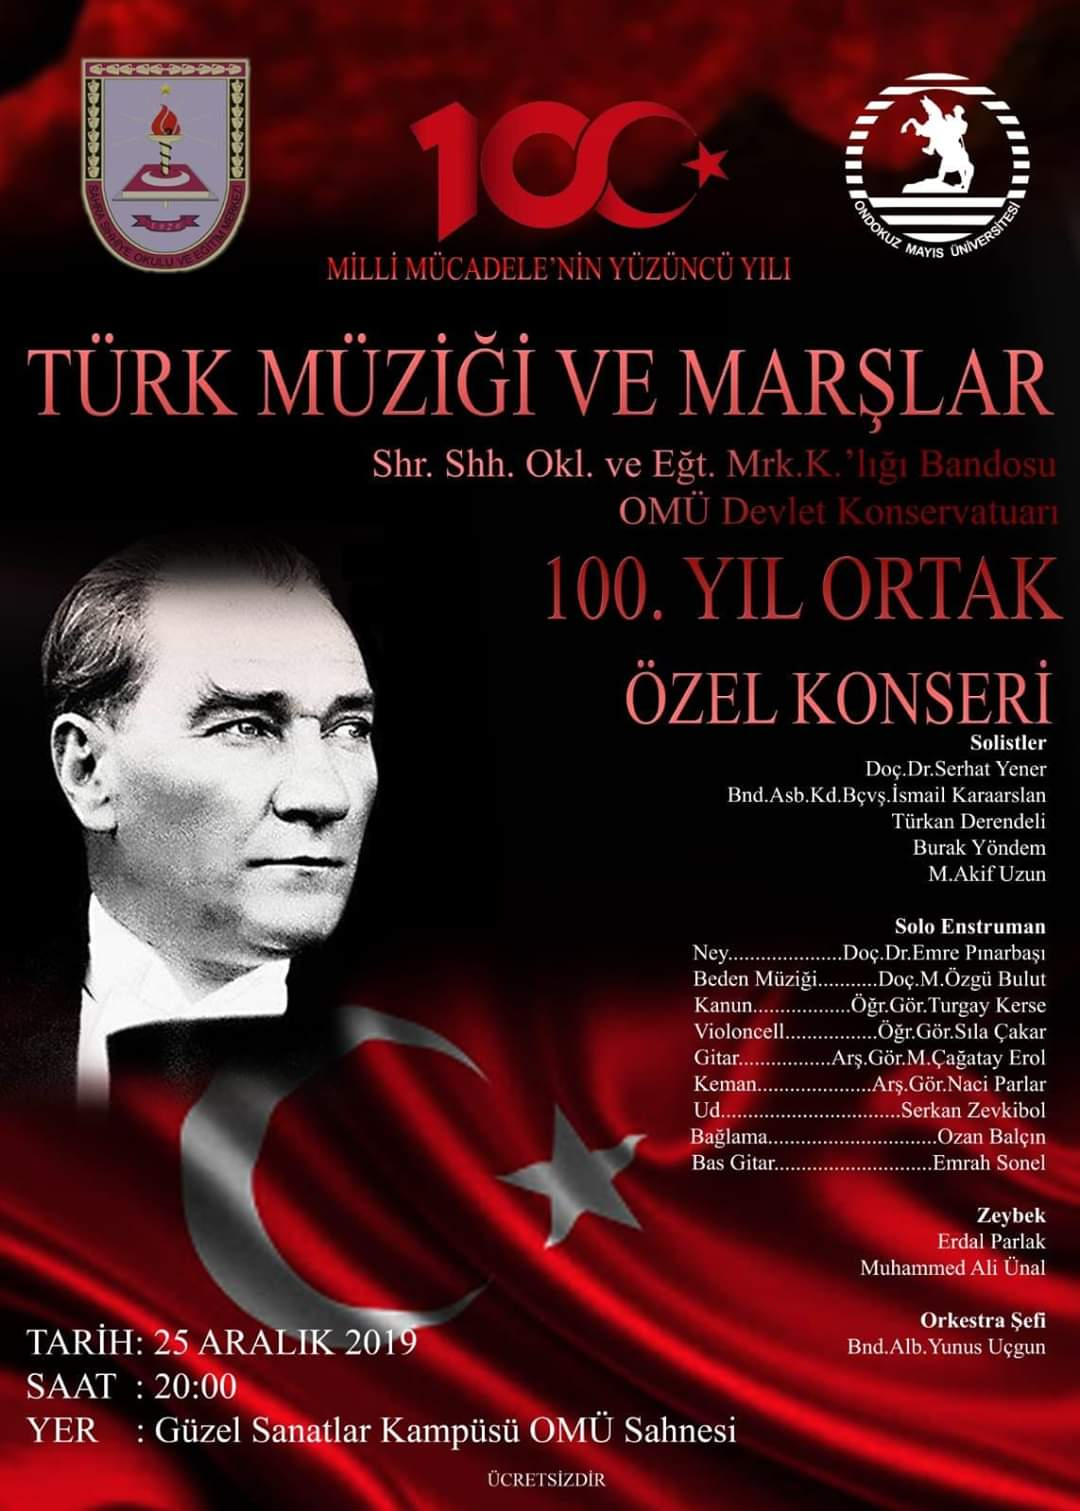 http://www.omu.edu.tr/sites/default/files/turk_muzigi_ve_marslar.jpeg